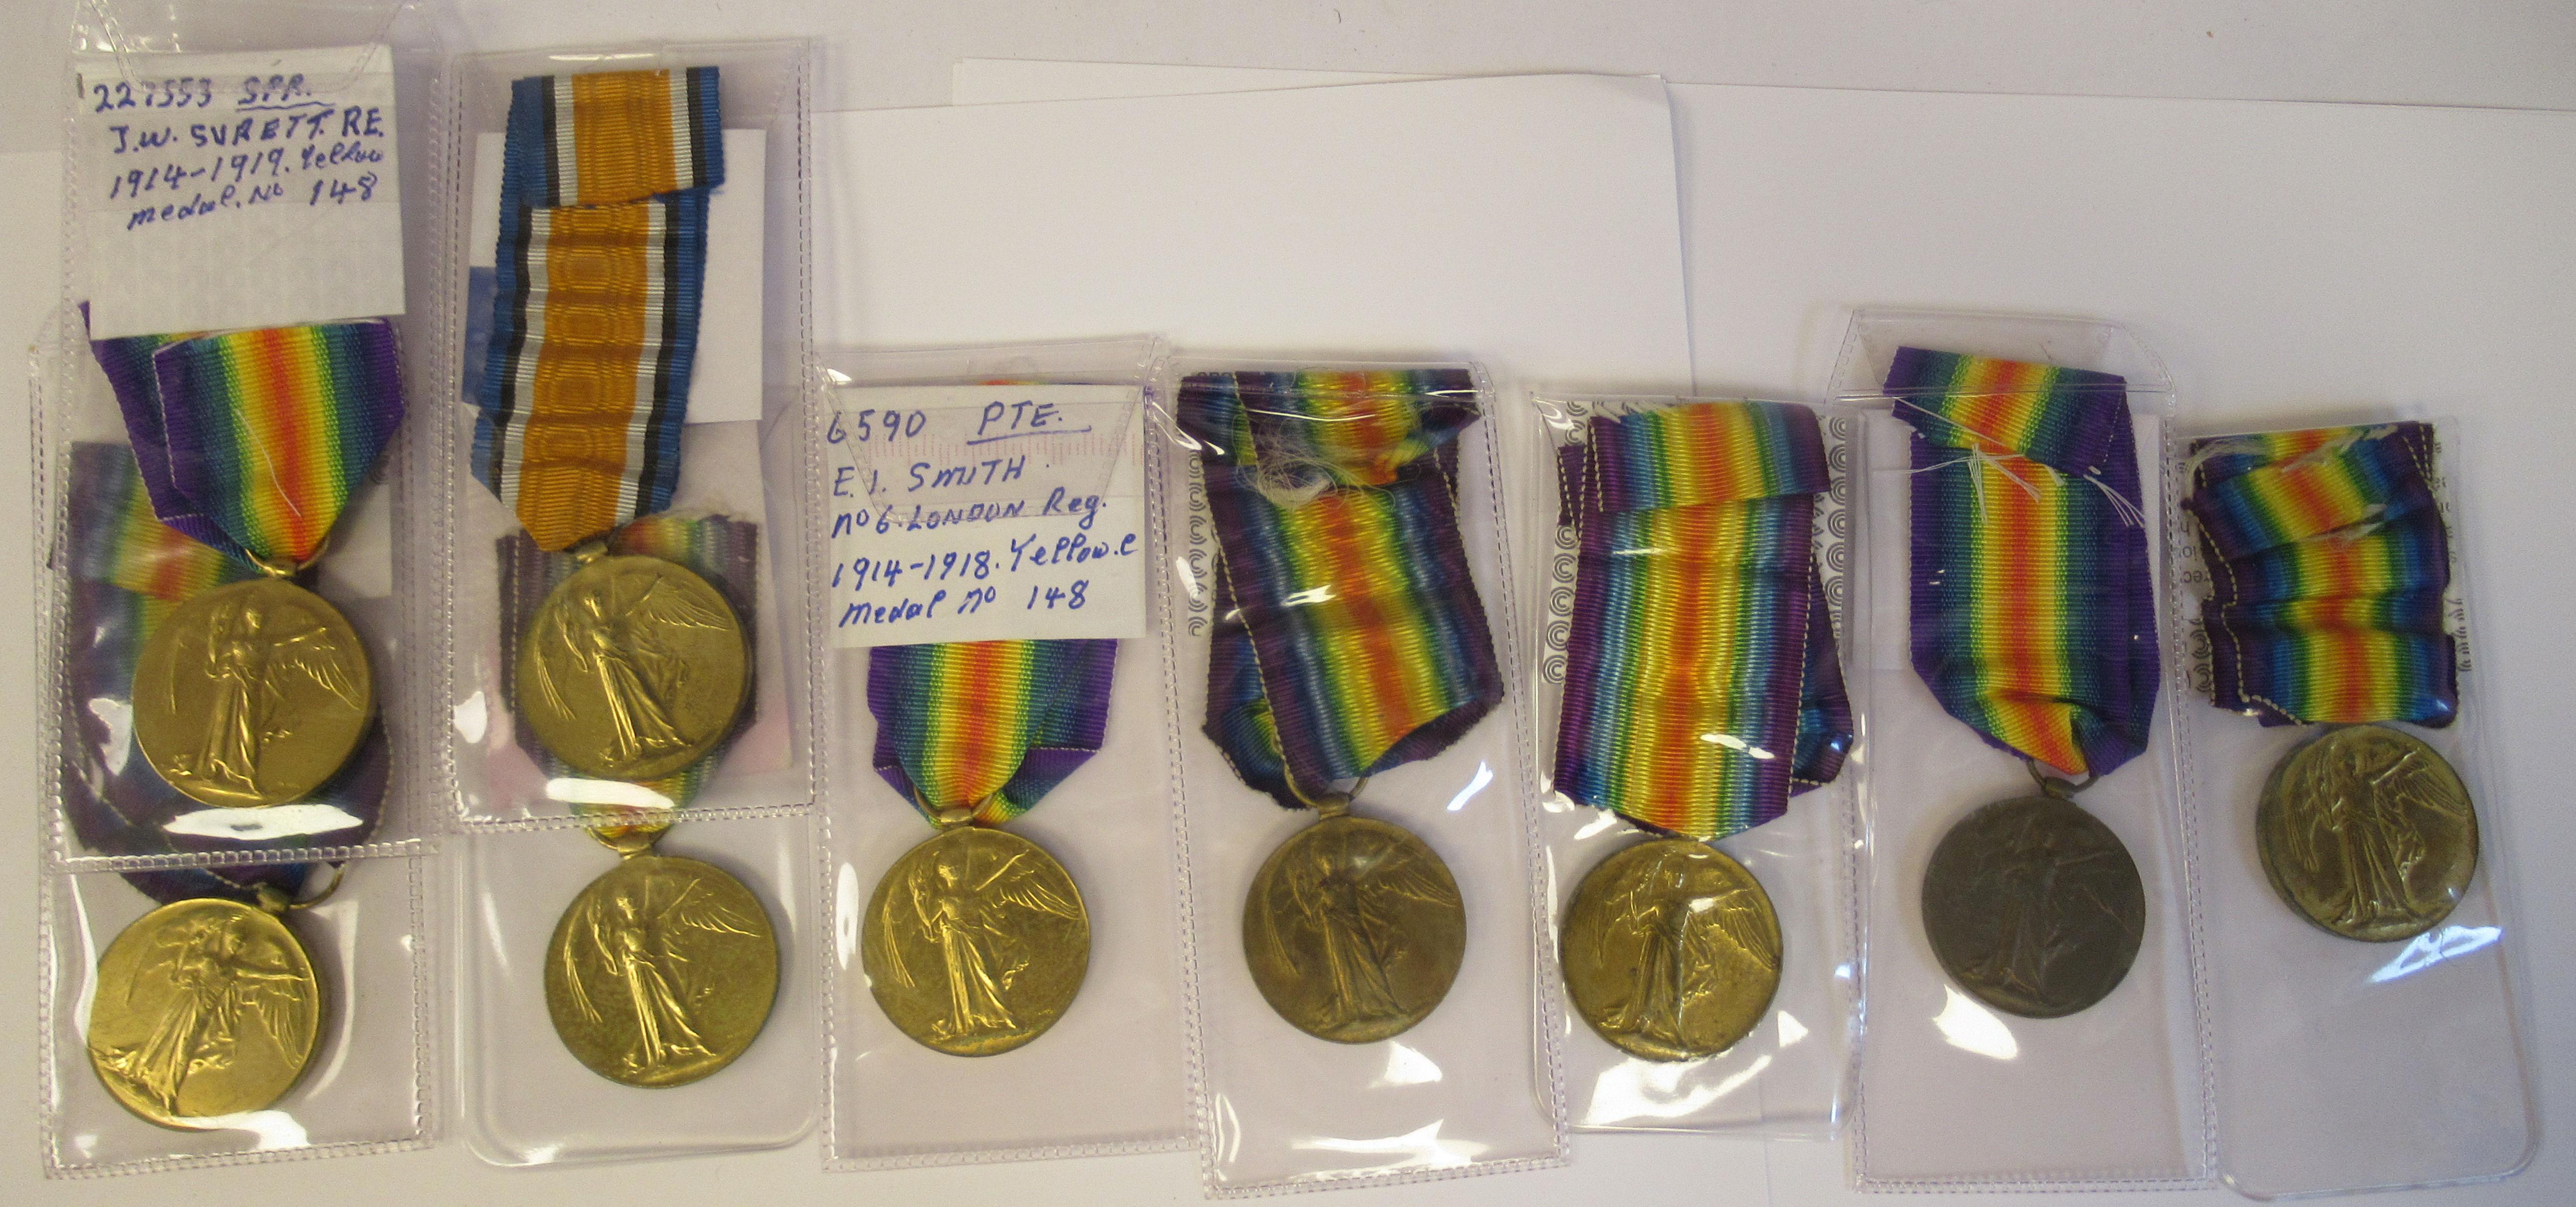 Twenty-four Great War 1914-1918 British service medals on ribbons, viz. 46481, Gnr. E. Williamson - Image 8 of 16